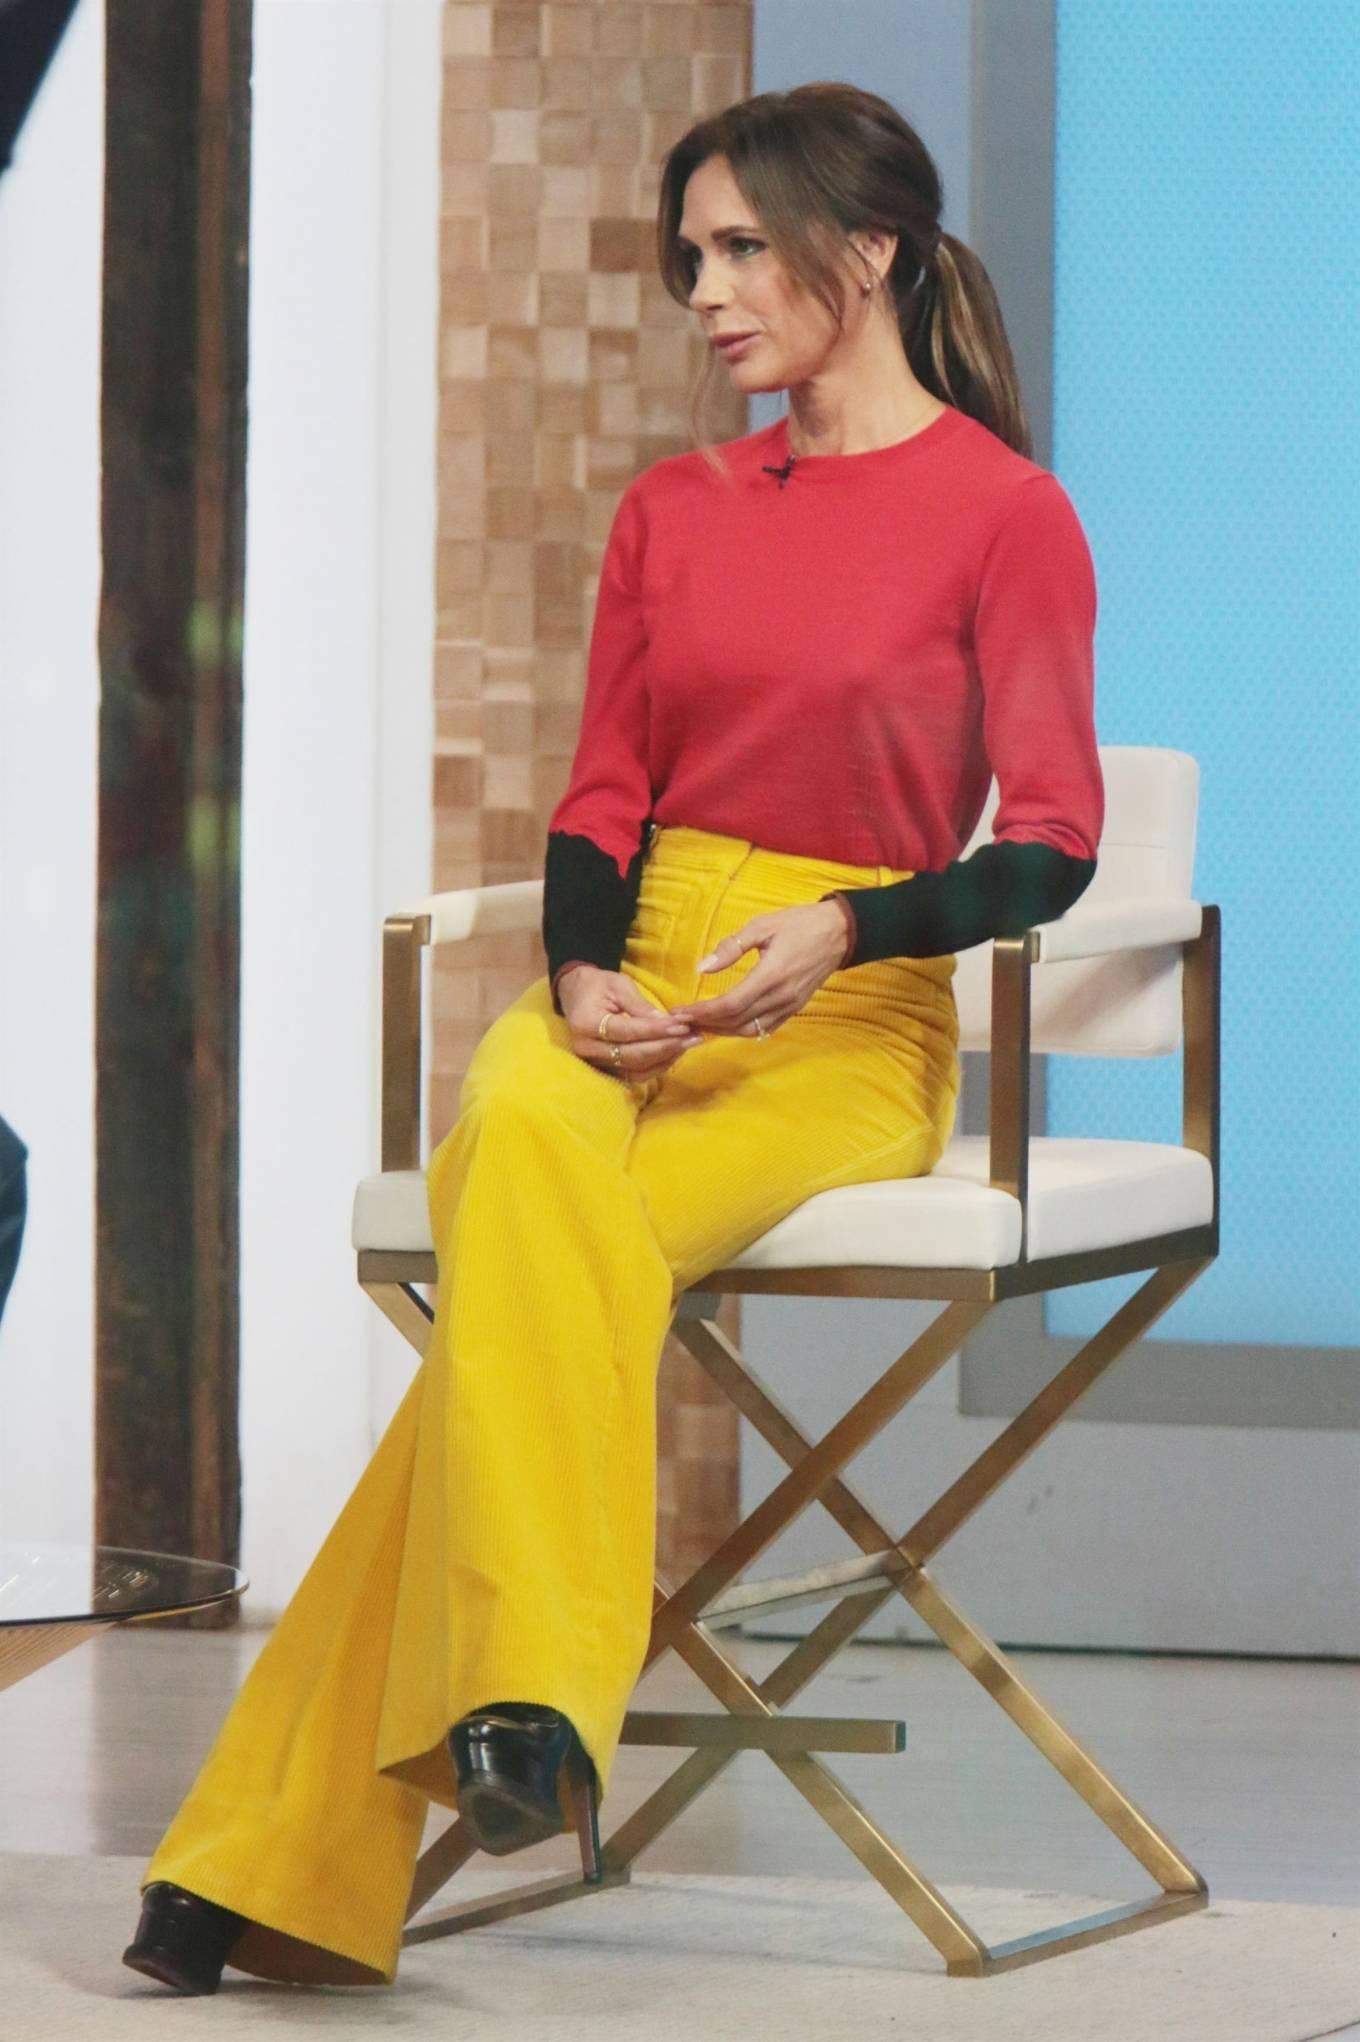 Victoria Beckham 2021 : Victoria Beckham – on Good Morning America promoting her new designer clothing in New York City-09